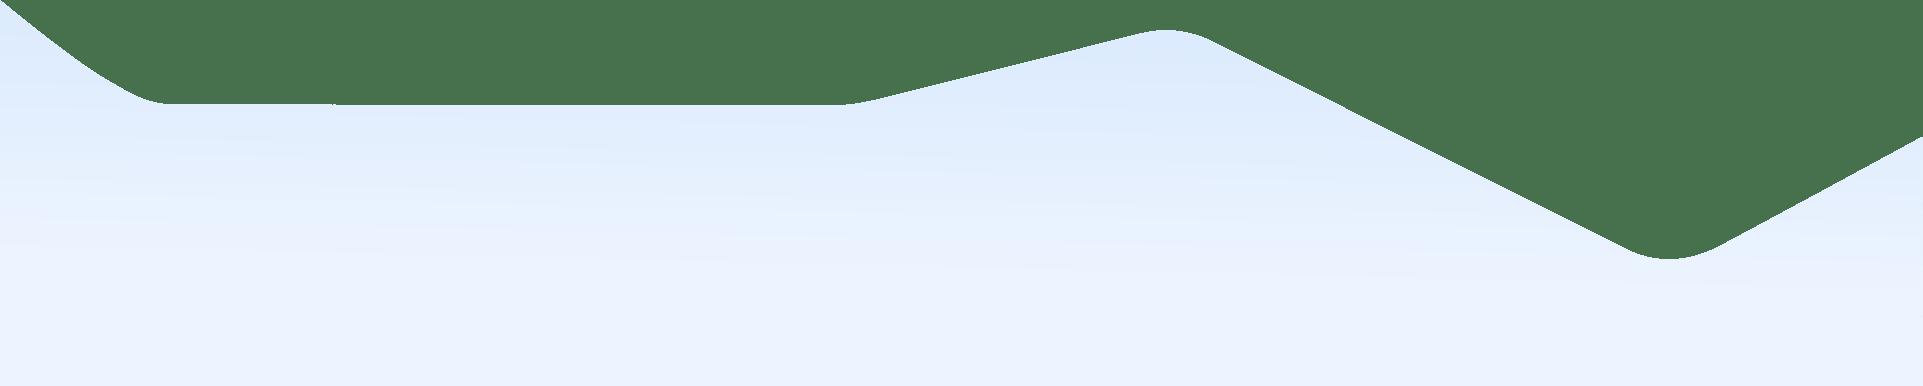 bushido-wave